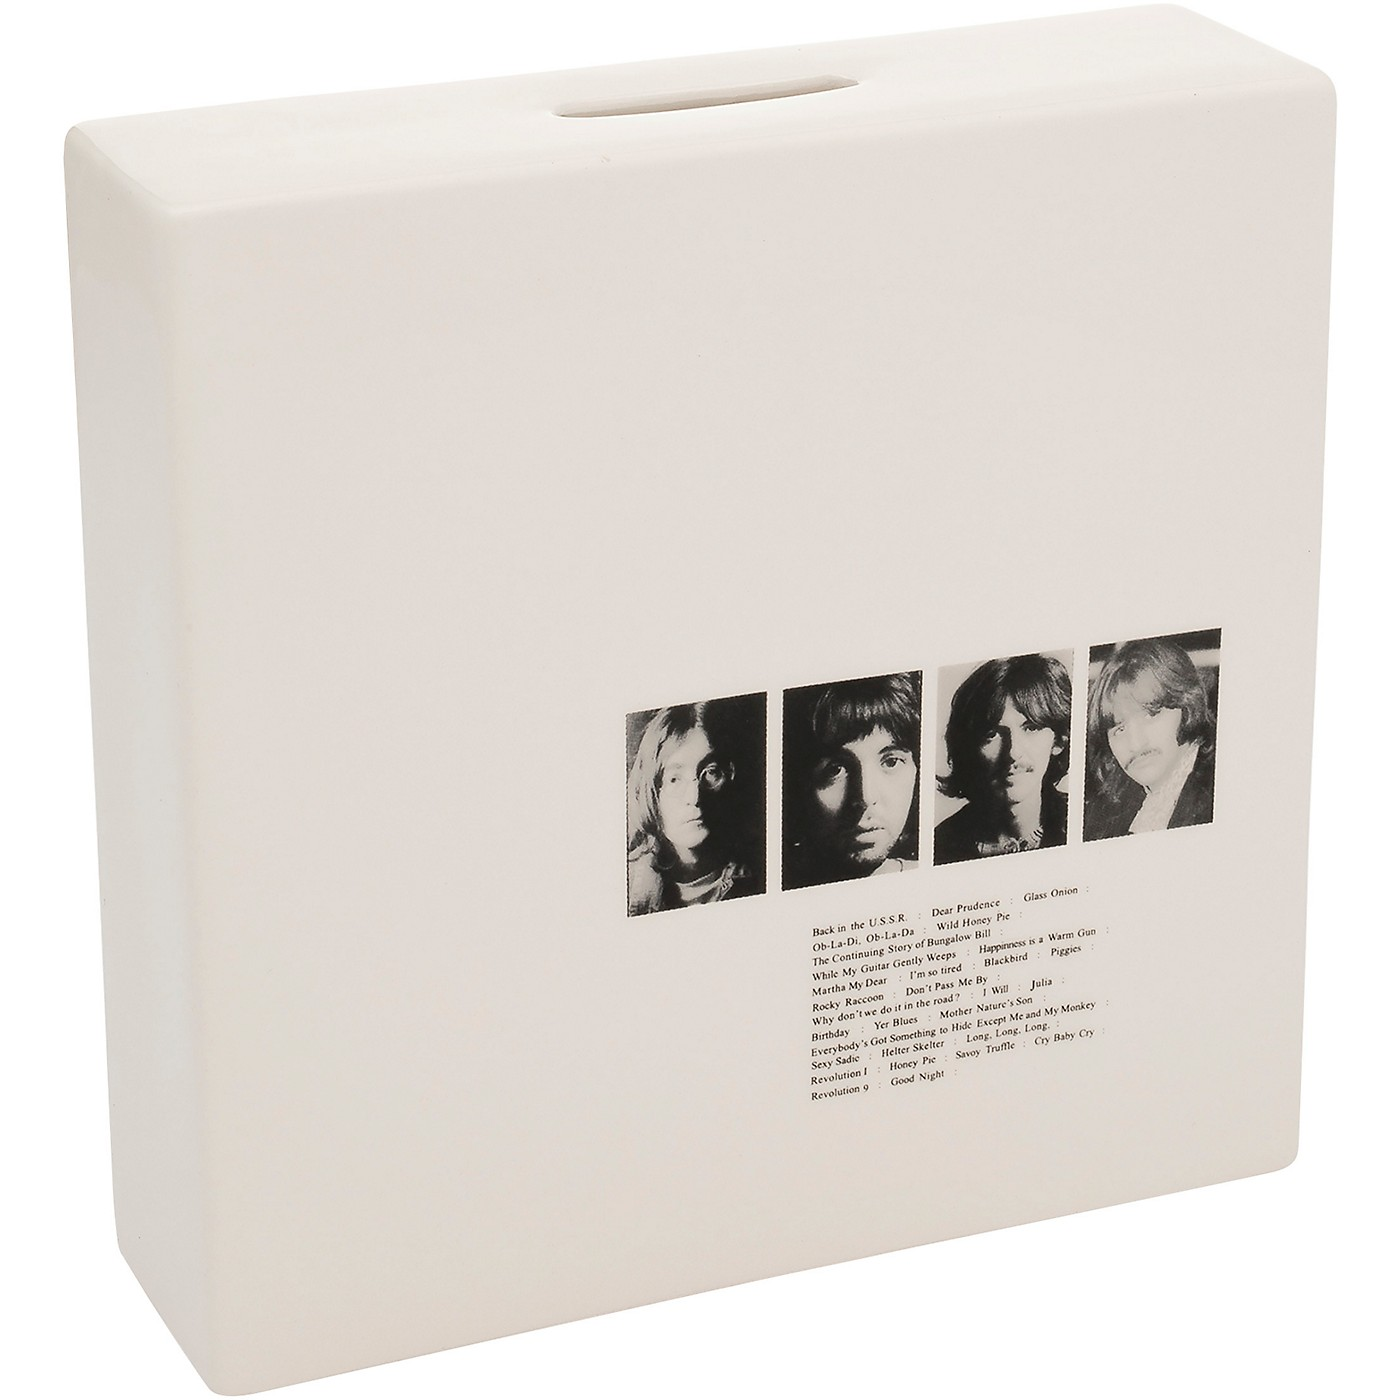 Vandor The Beatles Limited Edition White Album Ceramic Coin Bank thumbnail